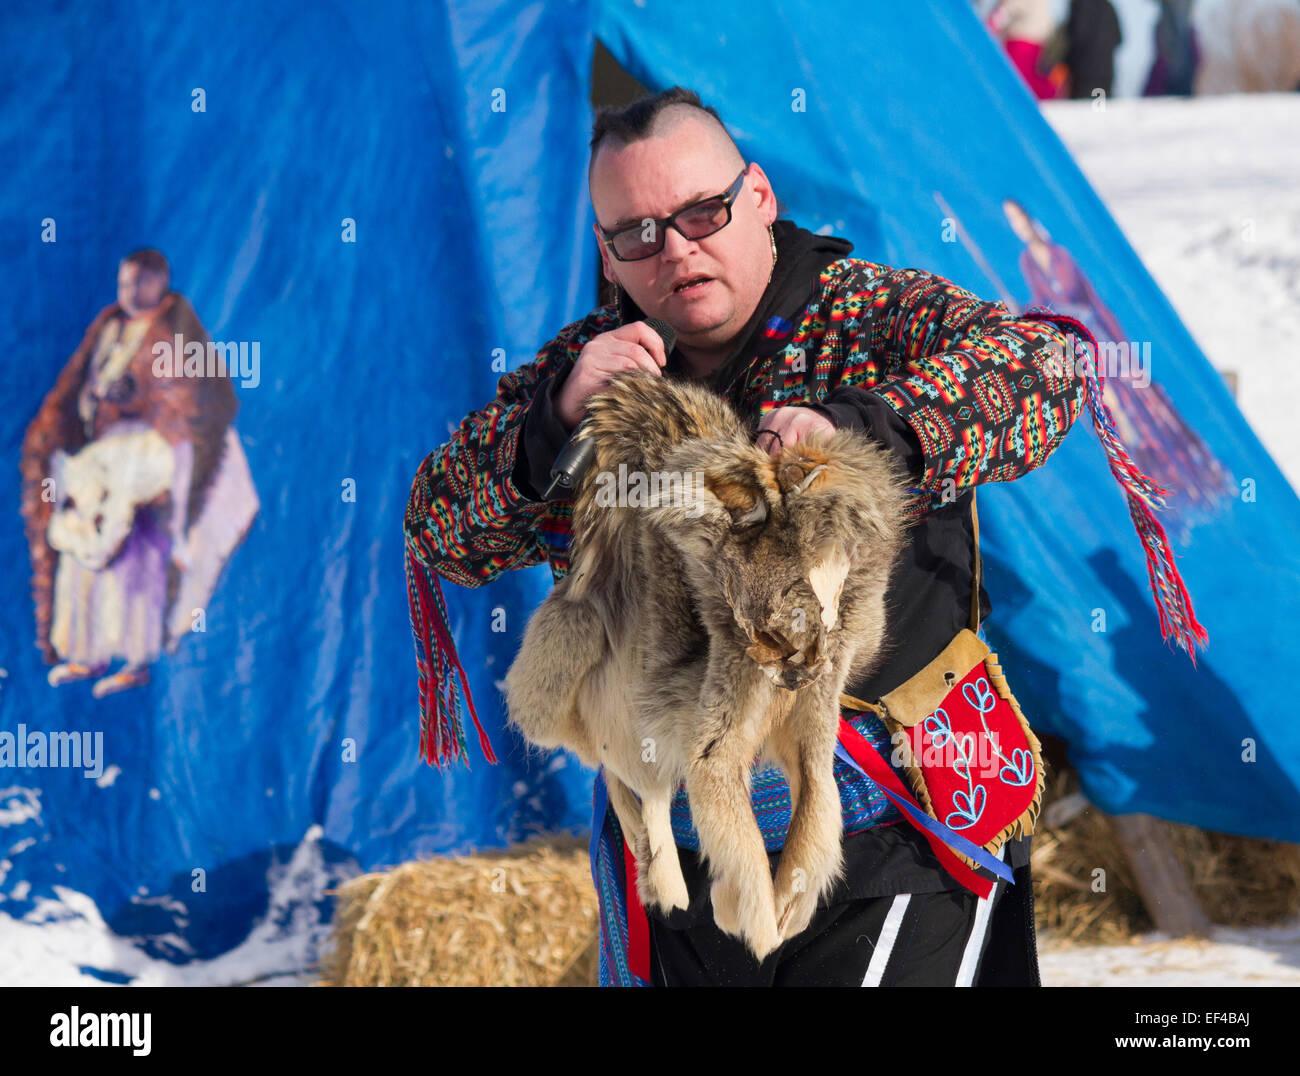 ojibway-story-teller-with-coyote-pelt-te